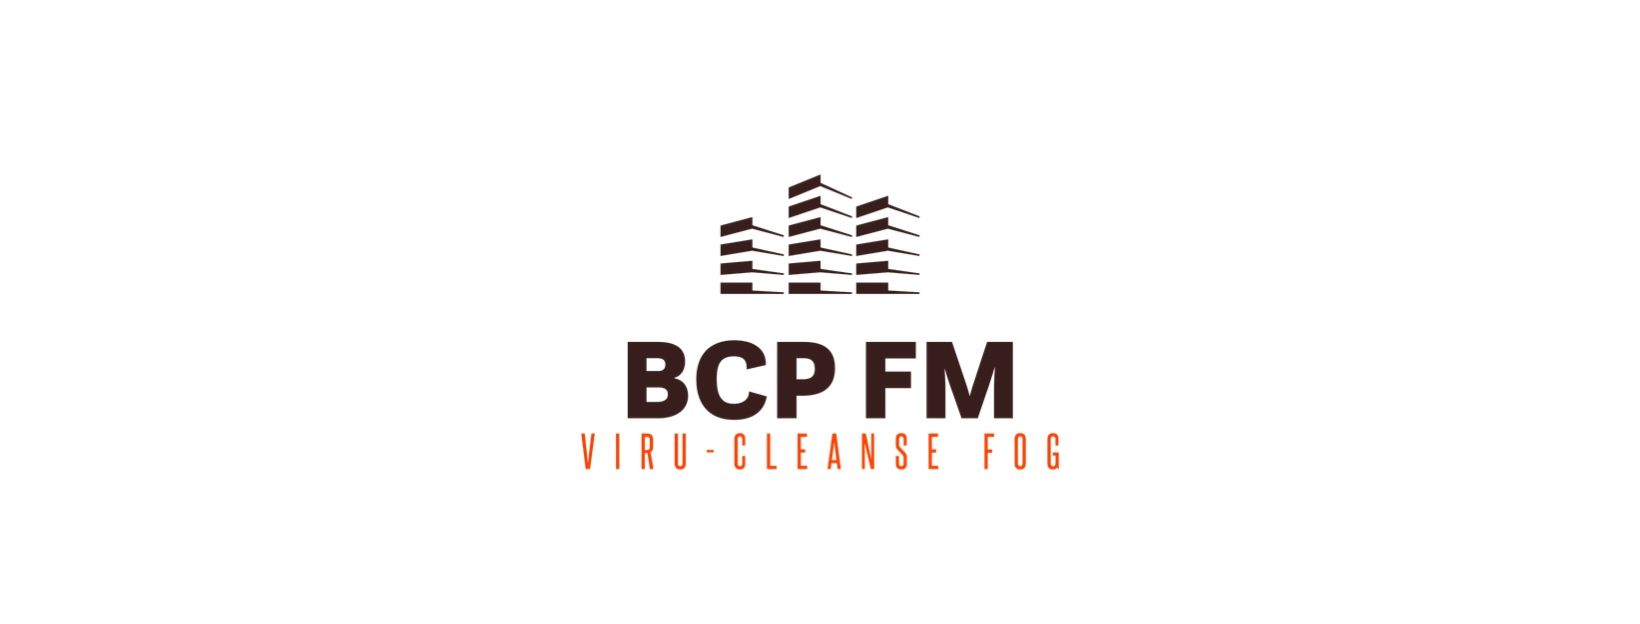 BCP FM